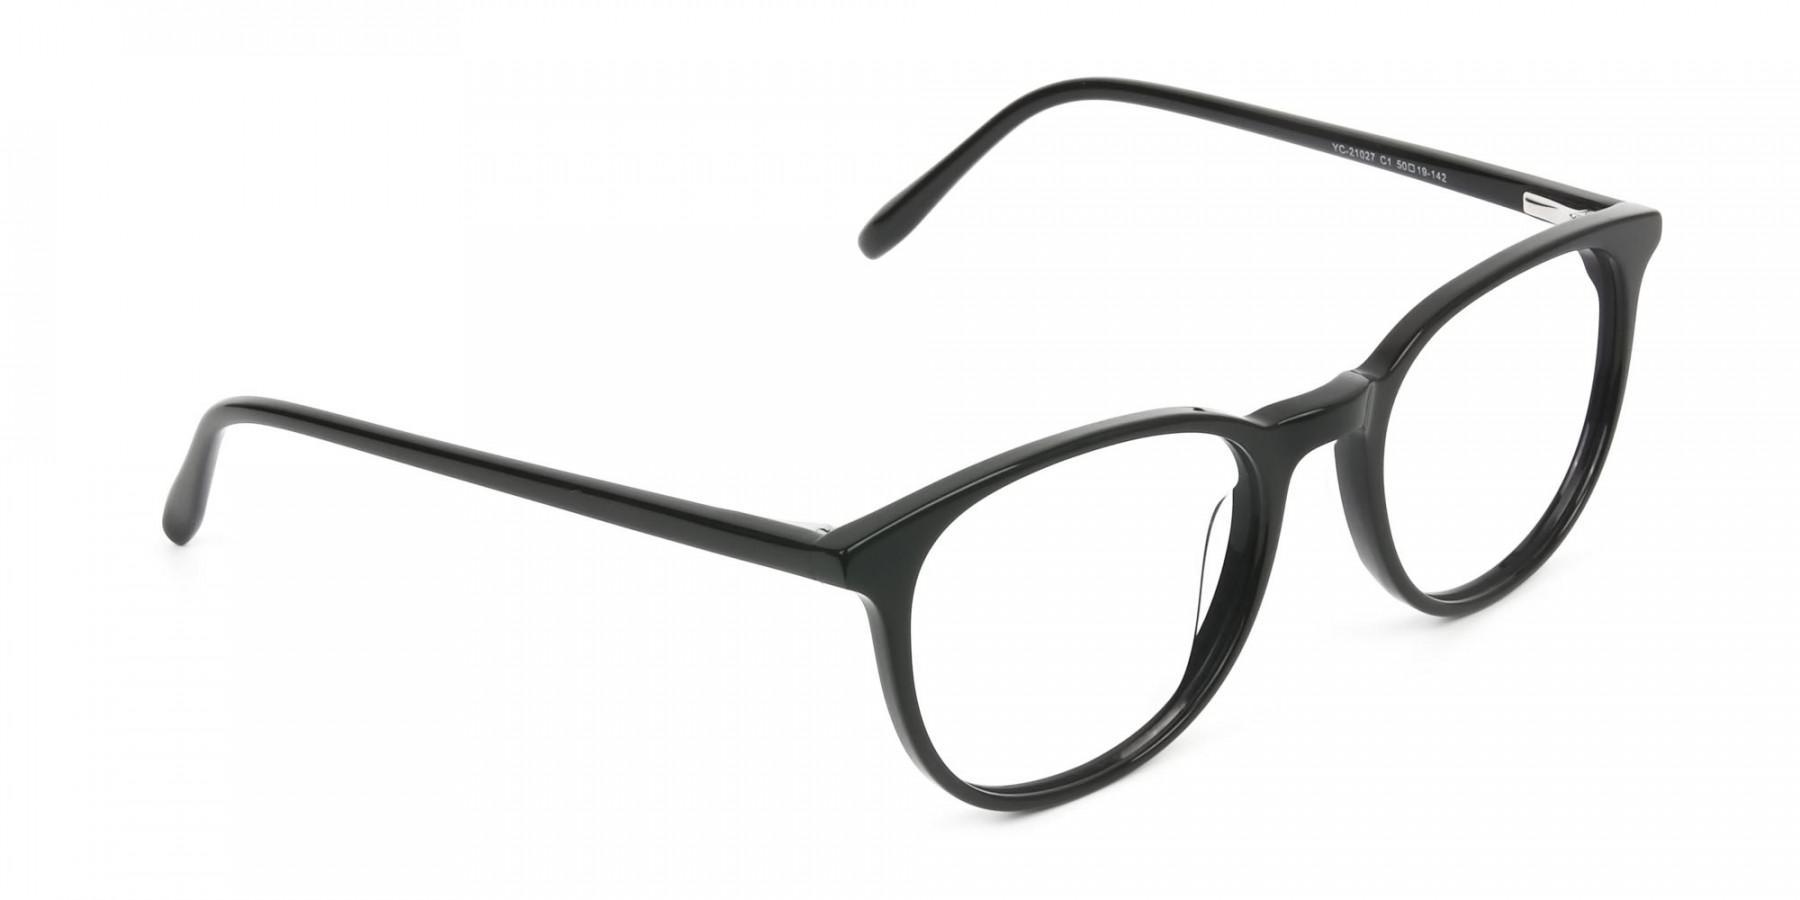 Round Black Eyeglasses in Full-Rim - 1